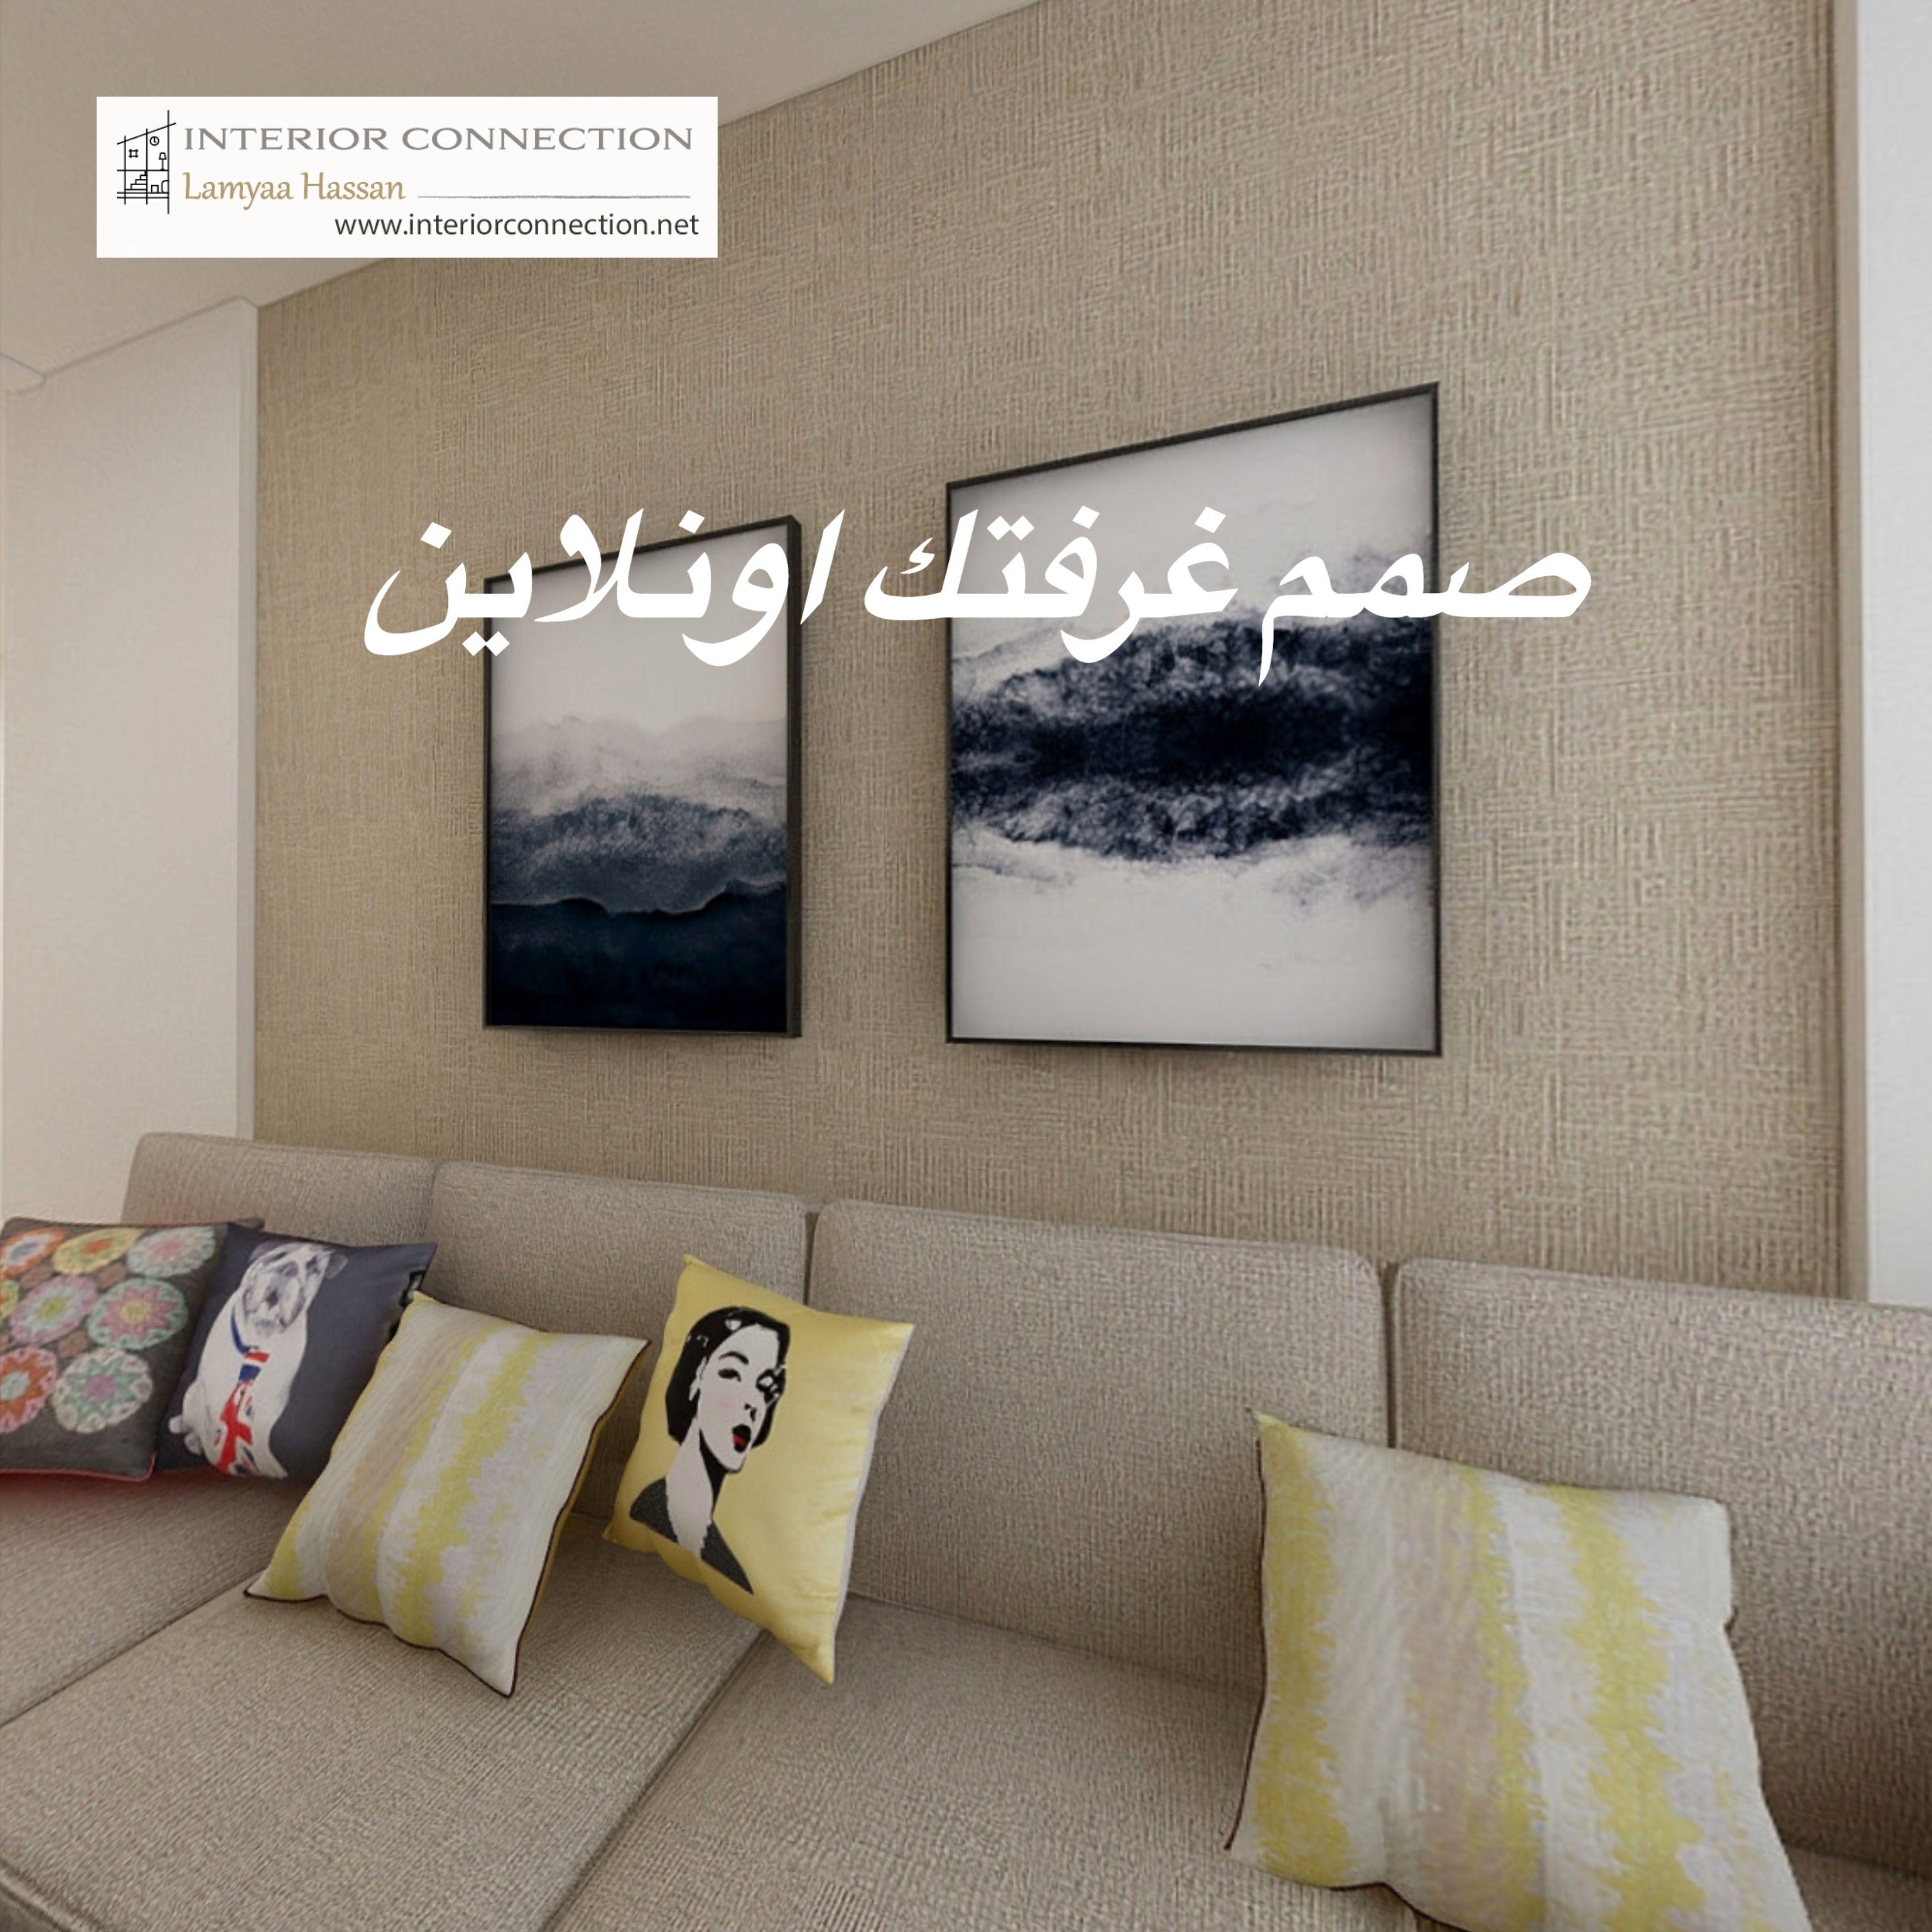 تصميم داخلي اونلاين Moroccan Bedroom Decor Home Decor